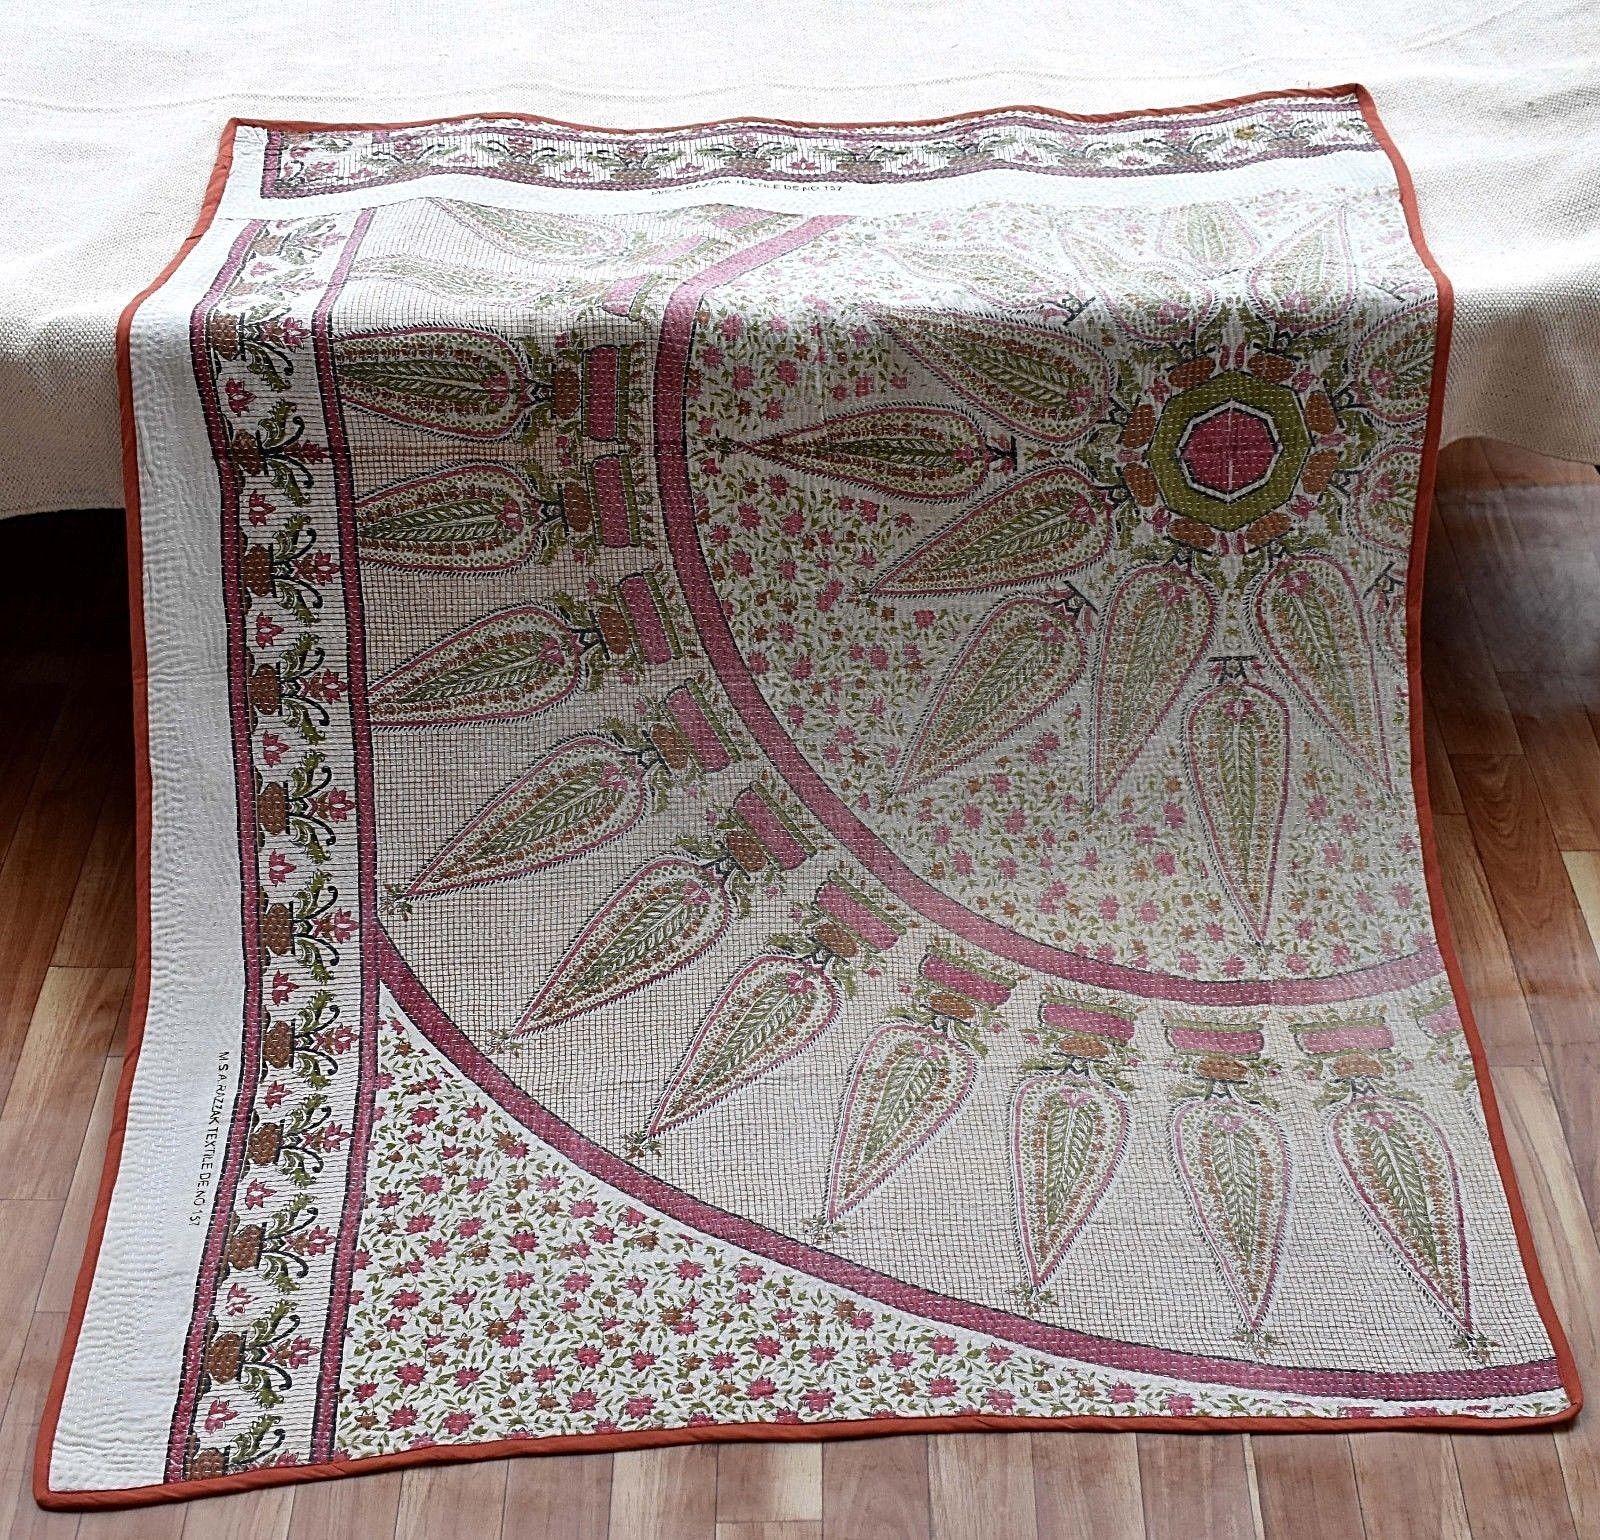 100% Cotton Handmade Indian Baby Kantha Quilt Geometric Recycled Sari Fabric